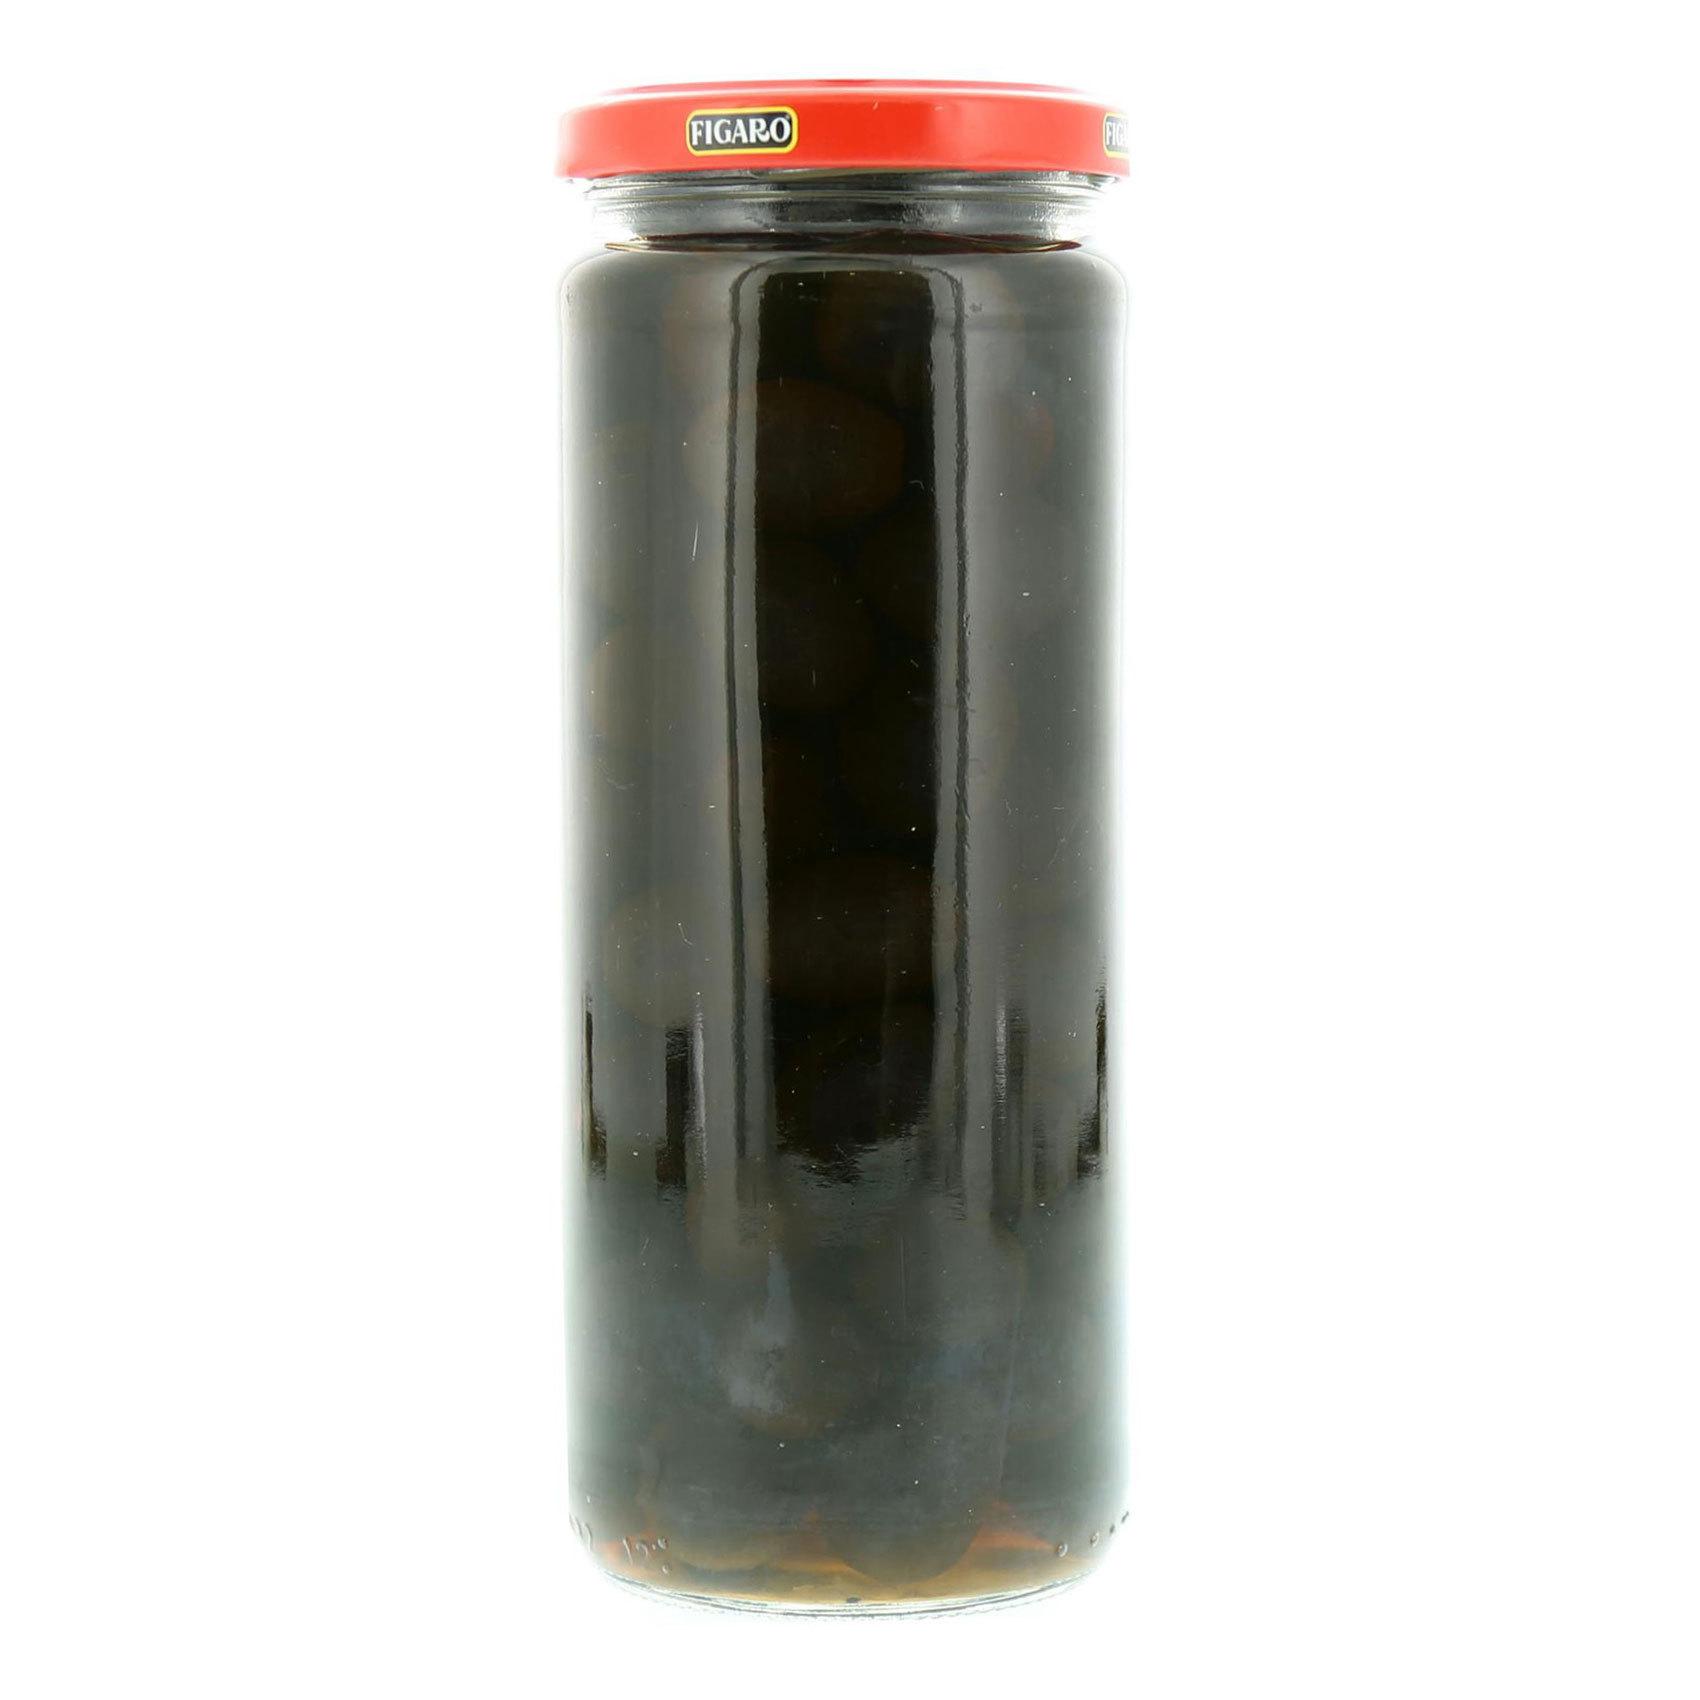 FIGARO PLAIN BLACK OLIVES 285GR